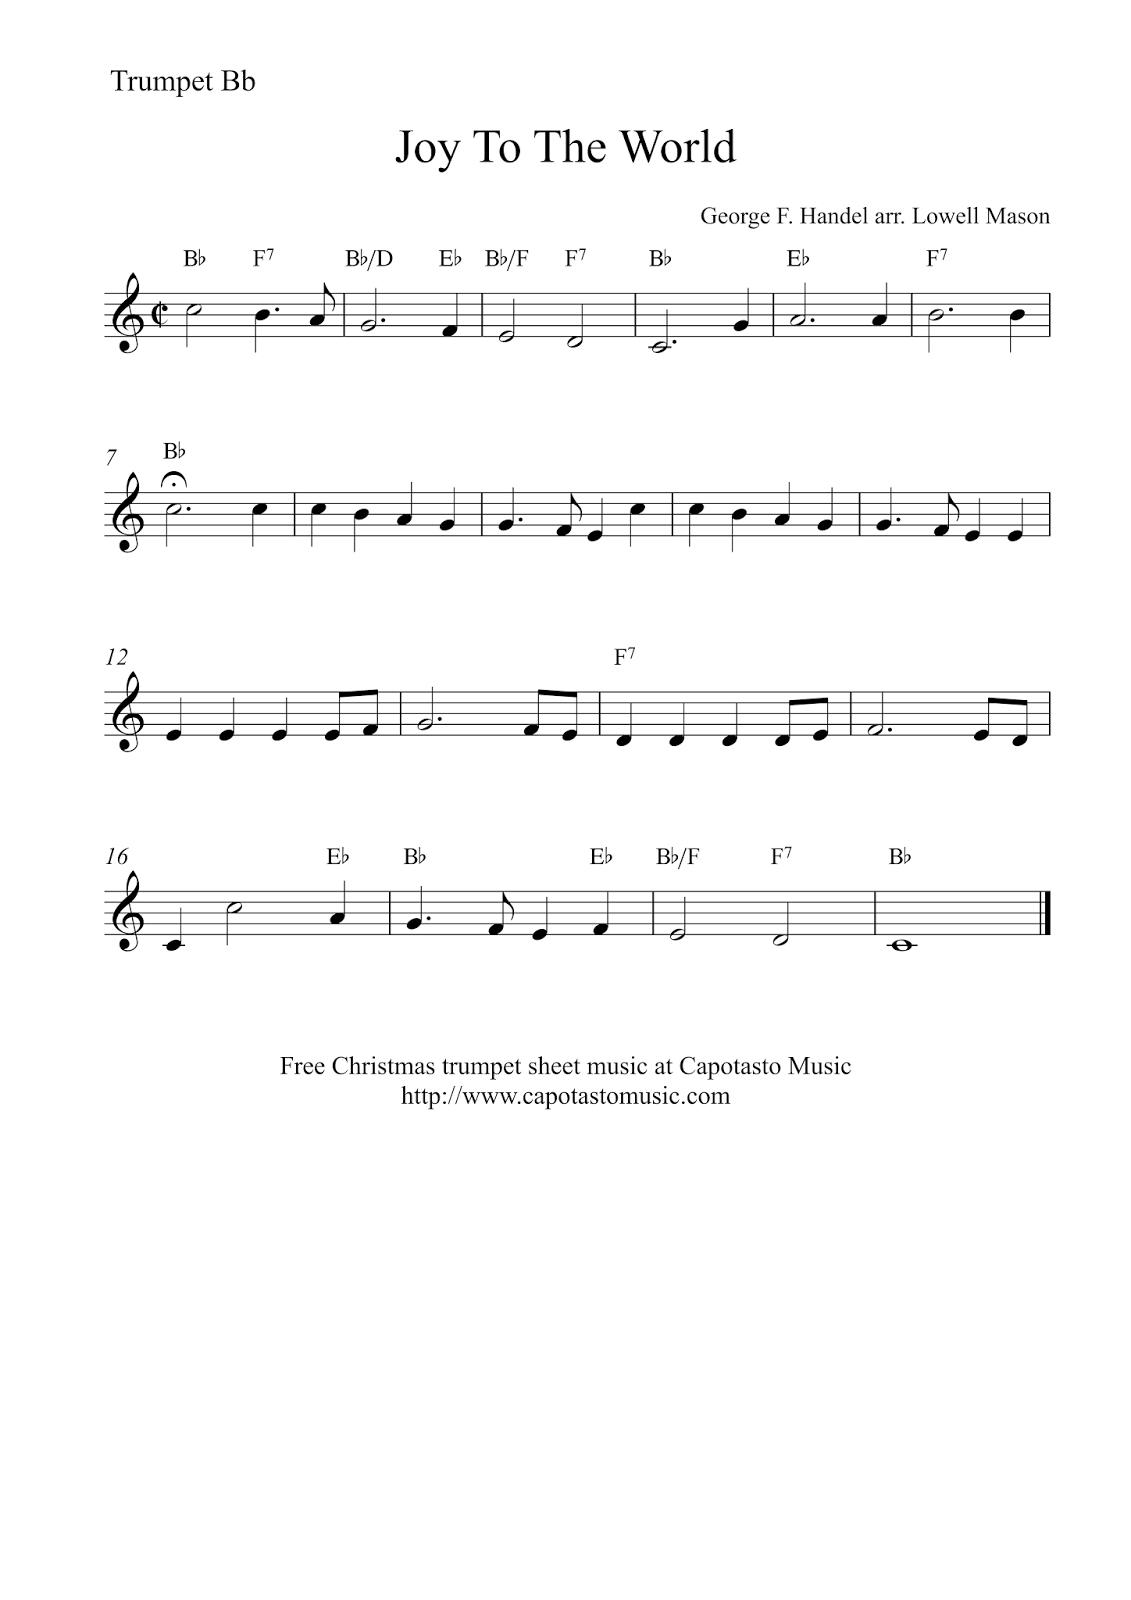 Joy To The World | Free Christmas Trumpet Sheet Music - Free Printable Sheet Music For Trumpet